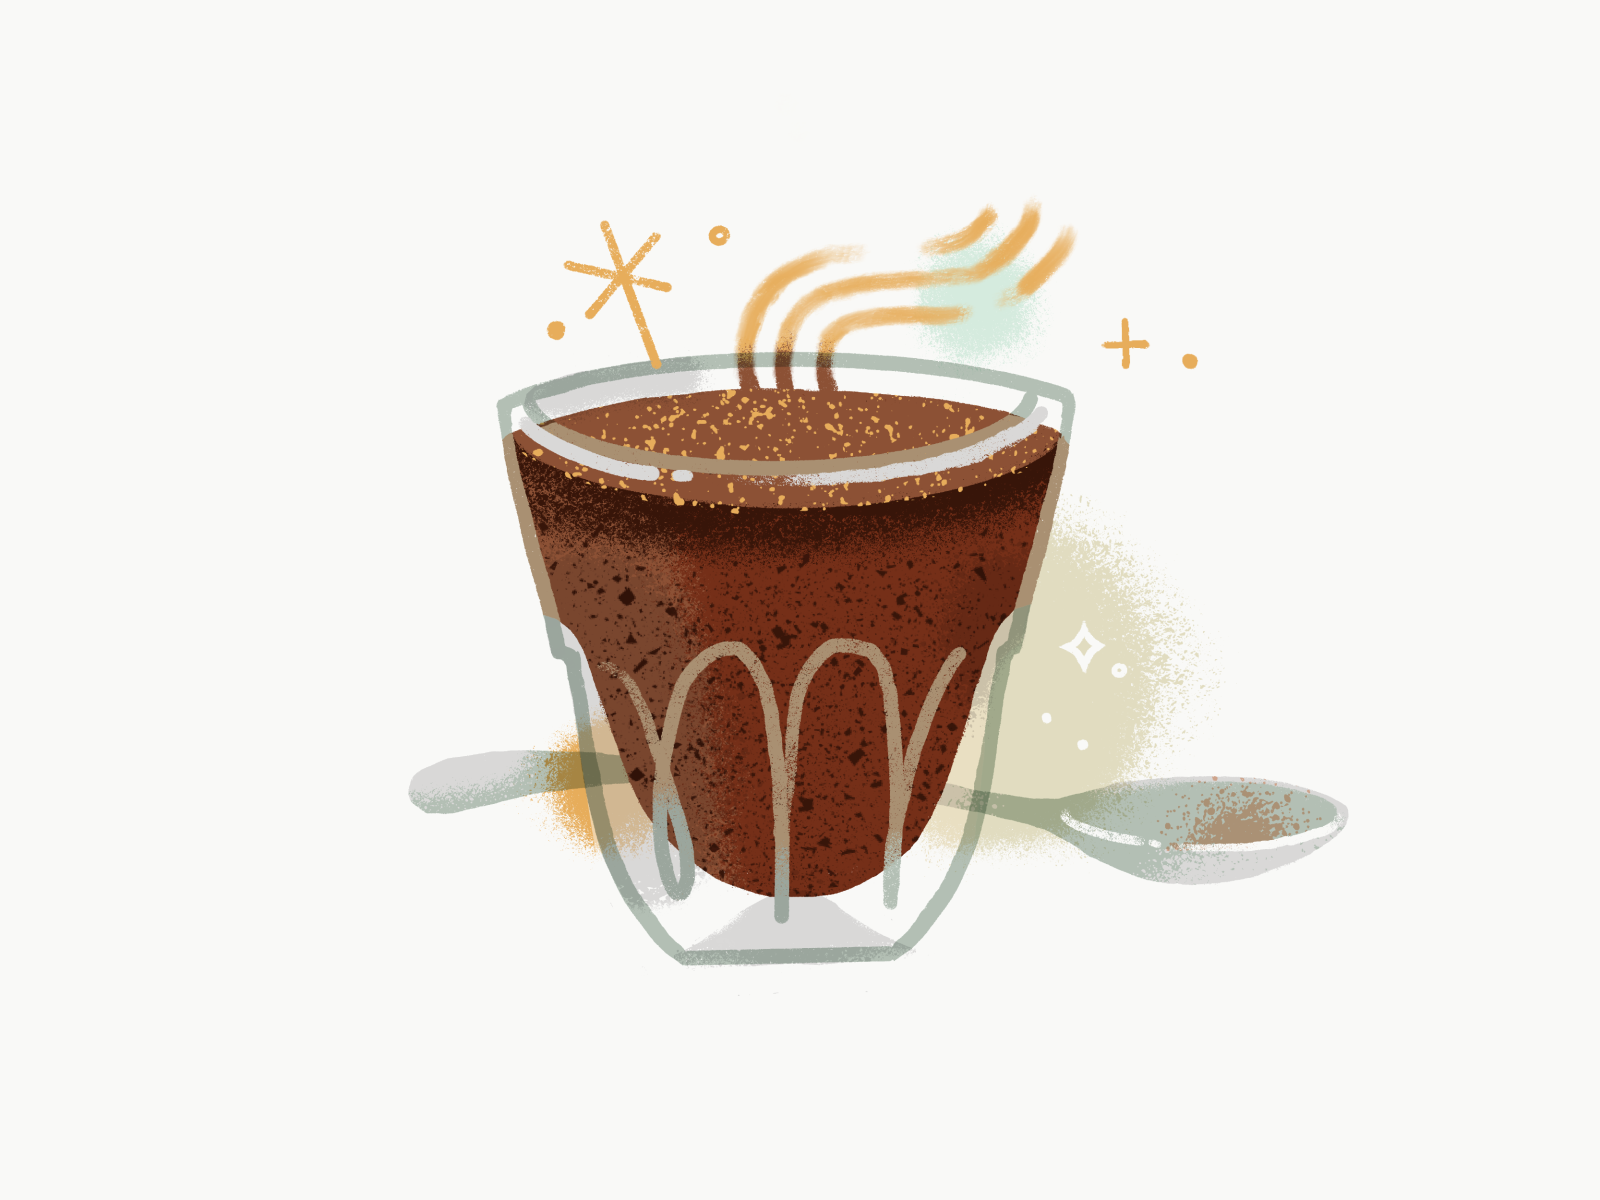 Coffee Coffee Coffee for Starbucks in 2020 Starbucks